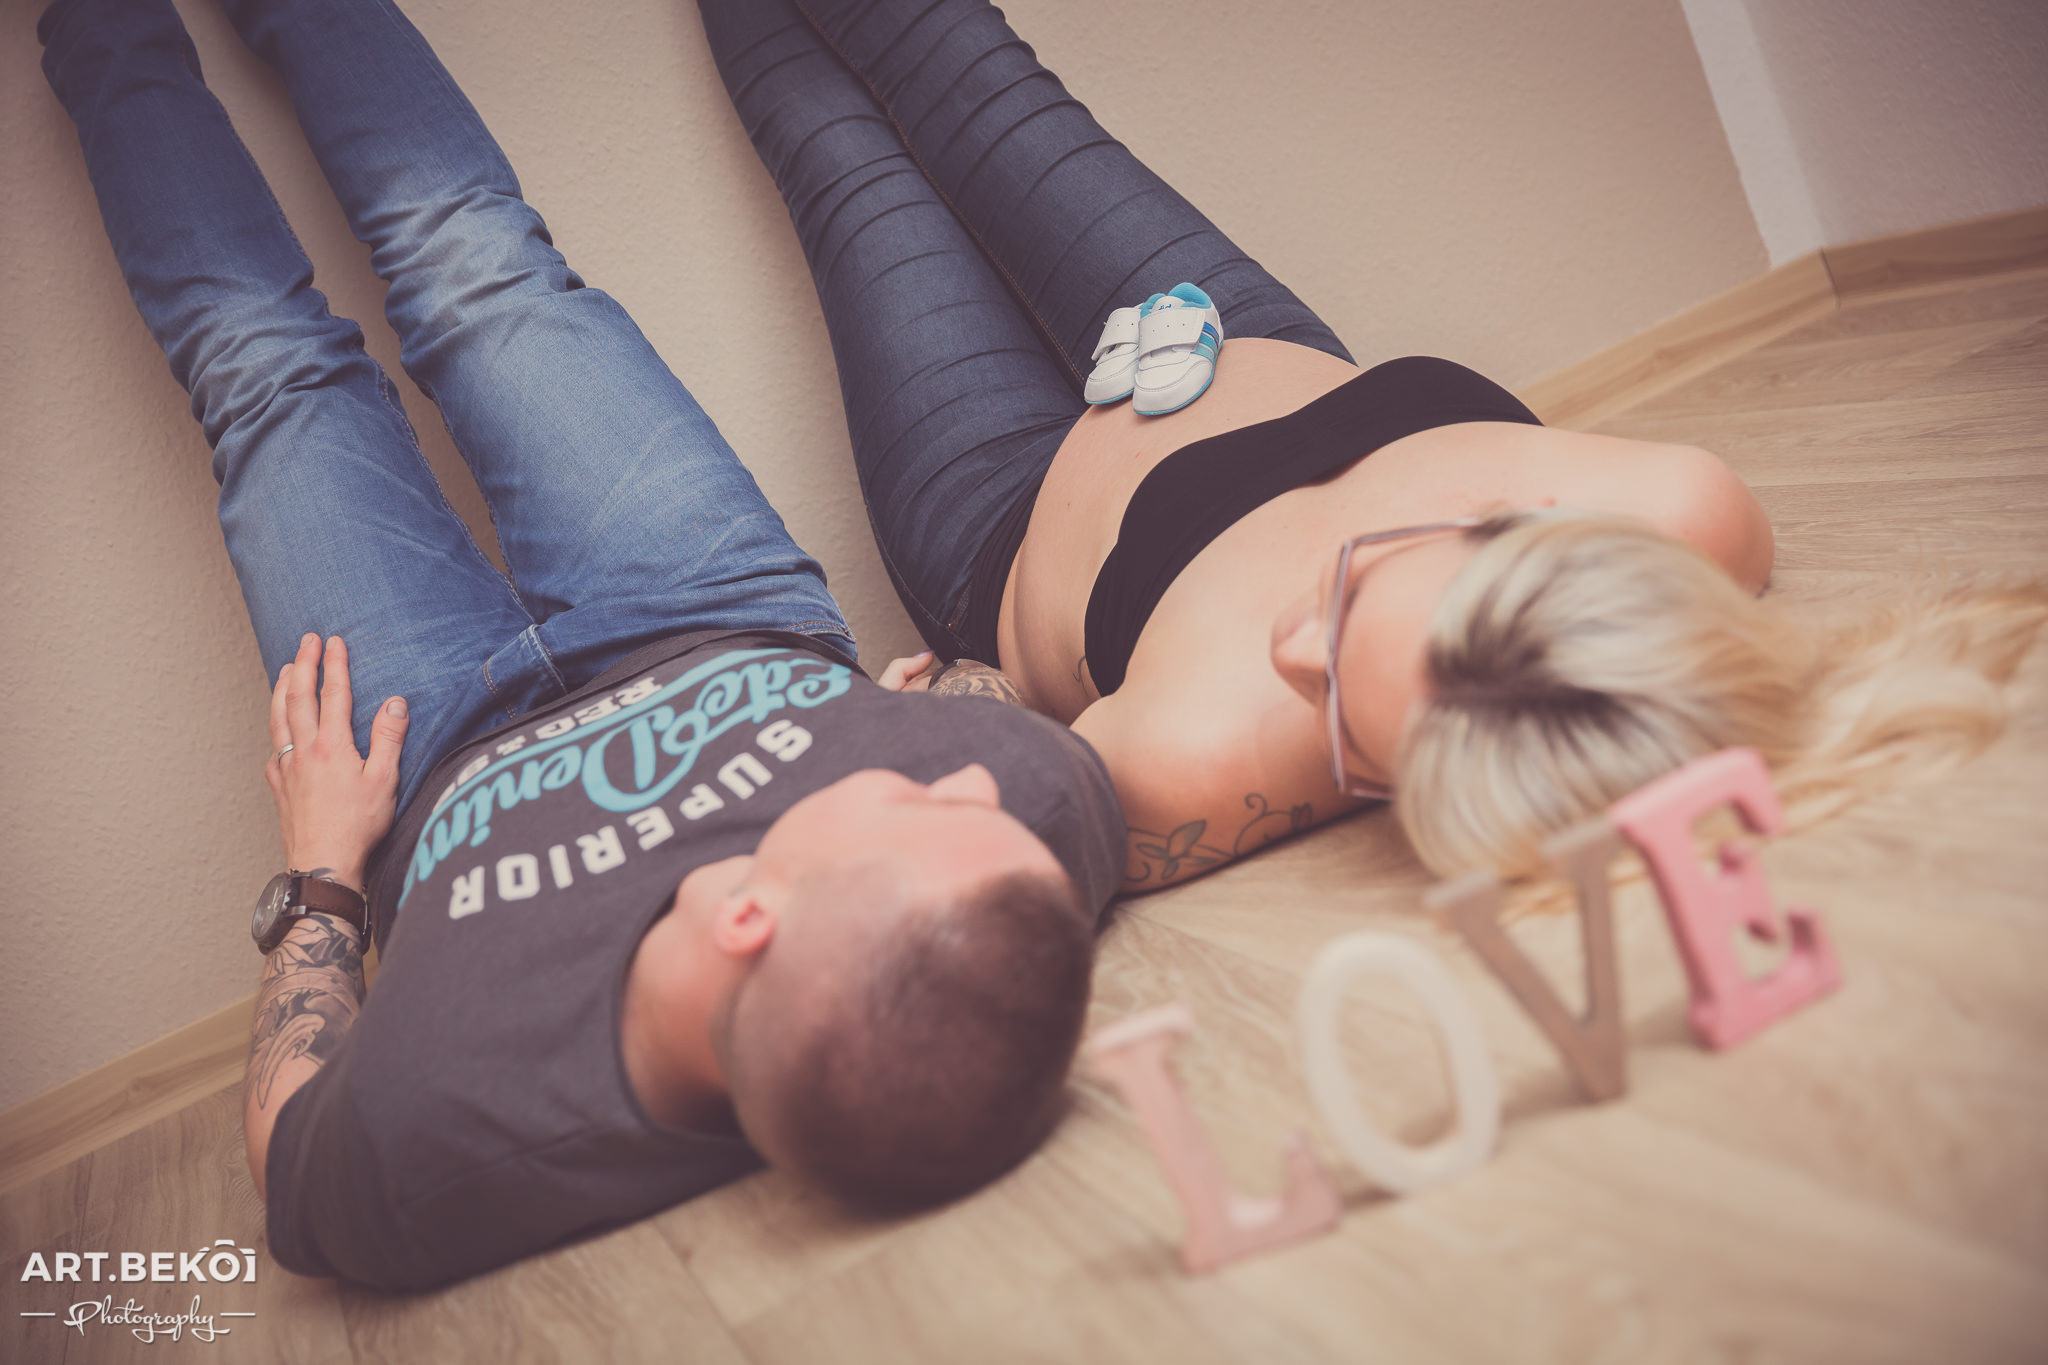 Familienshooting | Babybauch Janine & David